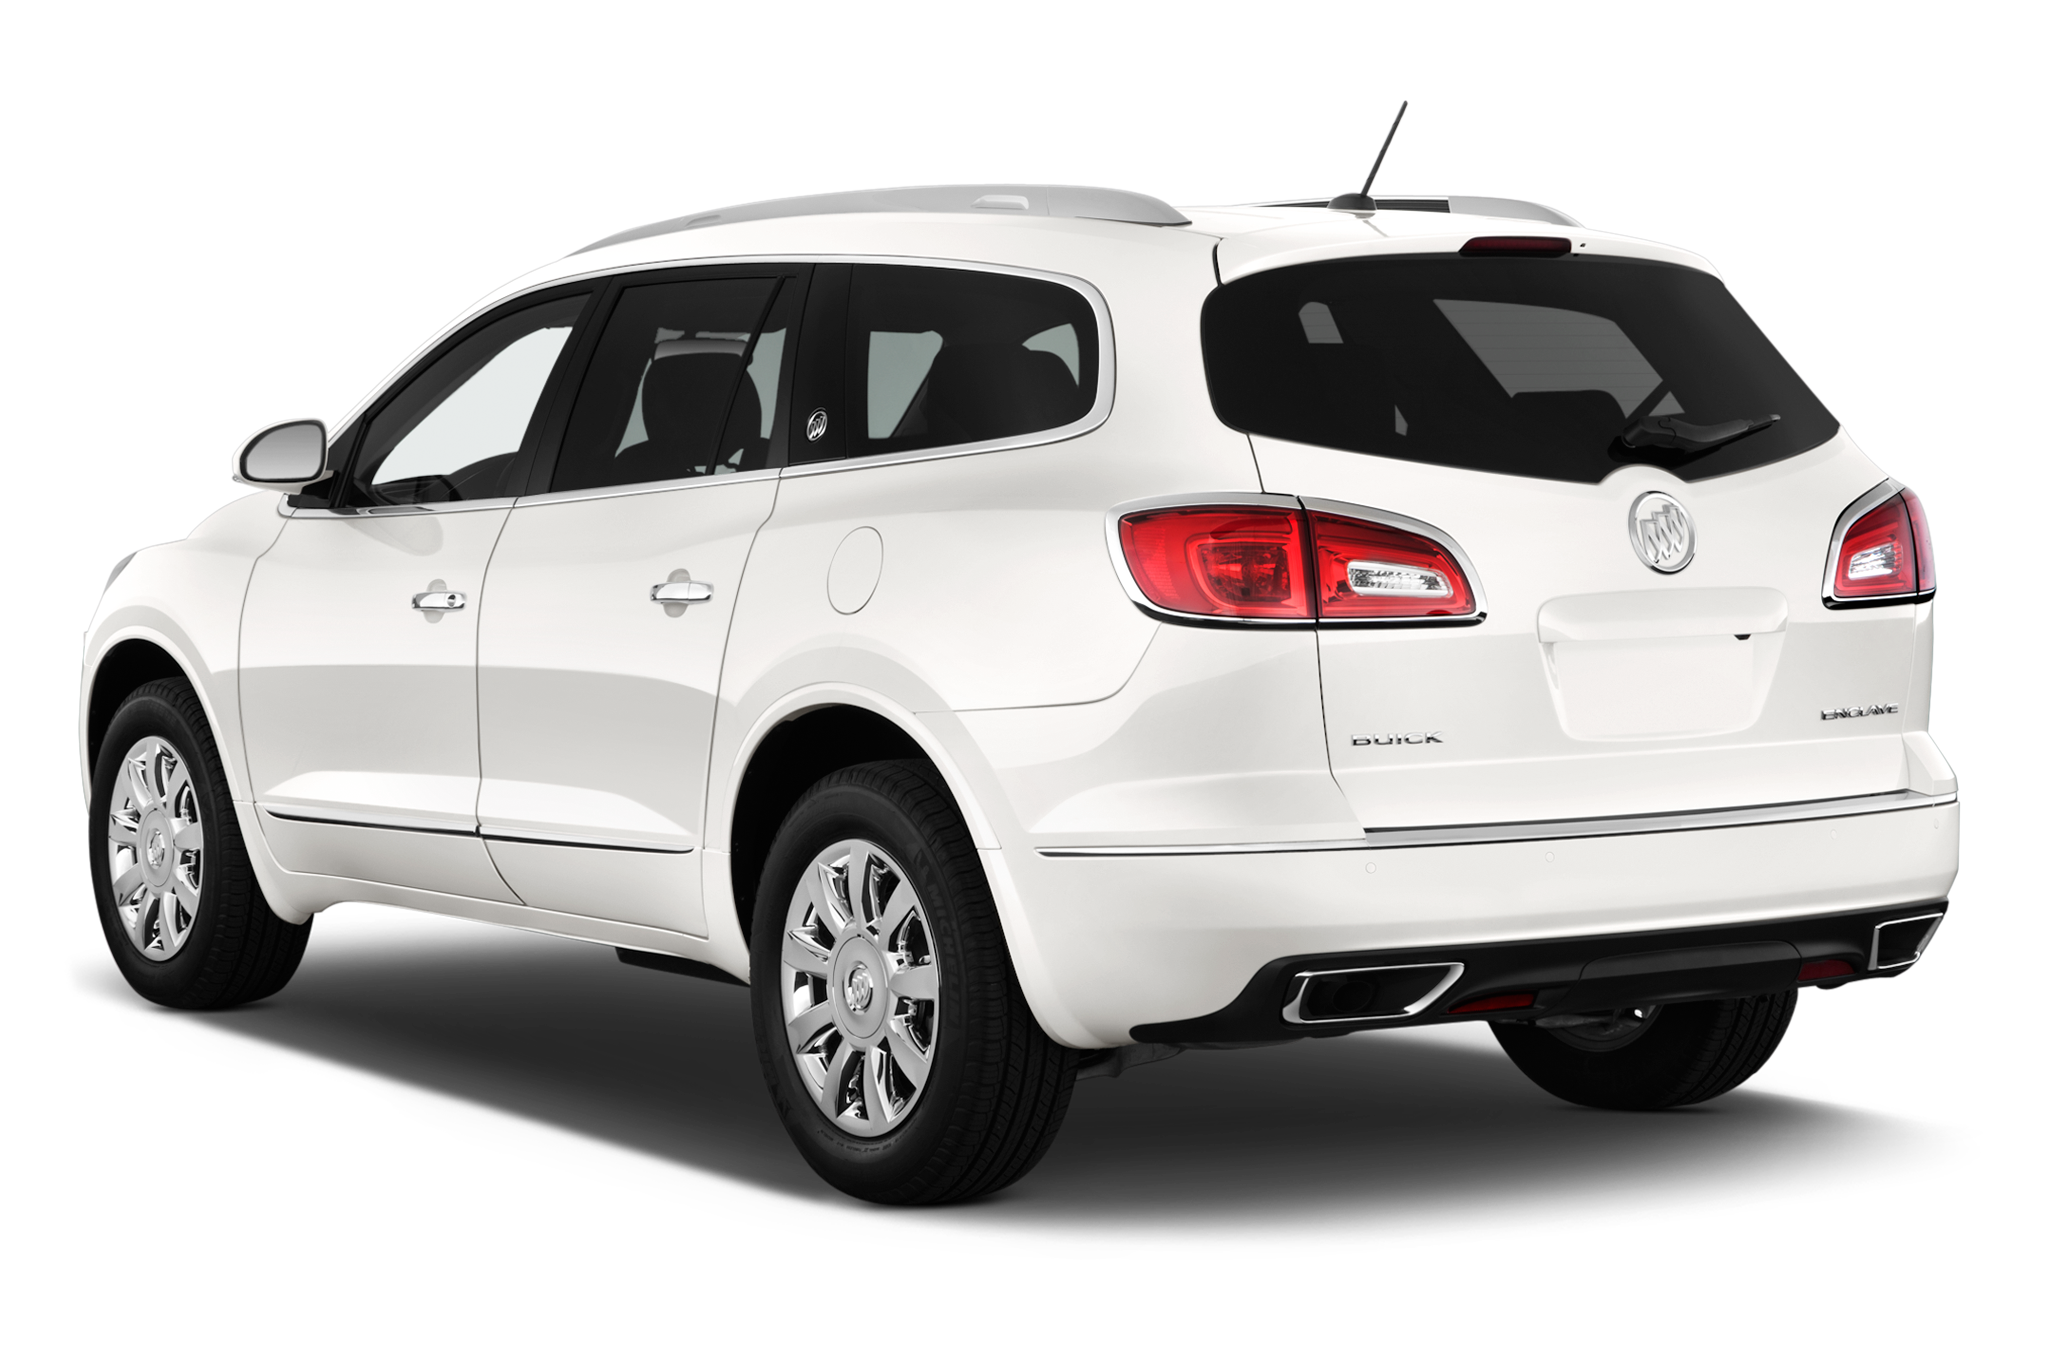 research trims photos options ca reviews price buick specs enclave autotrader